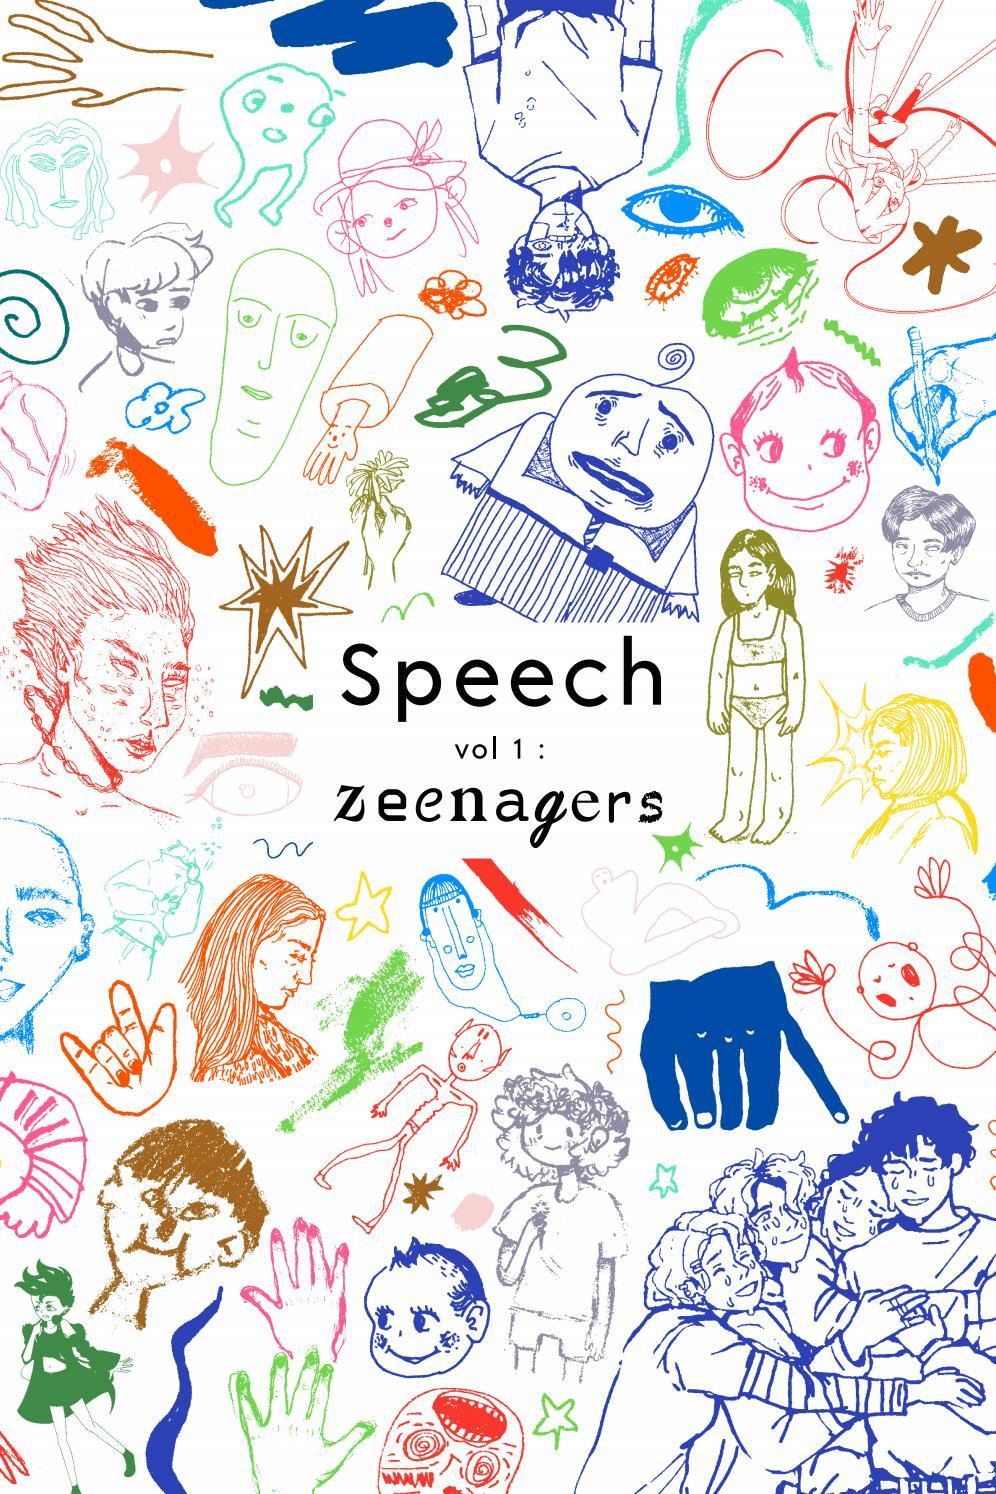 Speech Vol 1 Zeenagers By Kendra Dpnchc Issuu